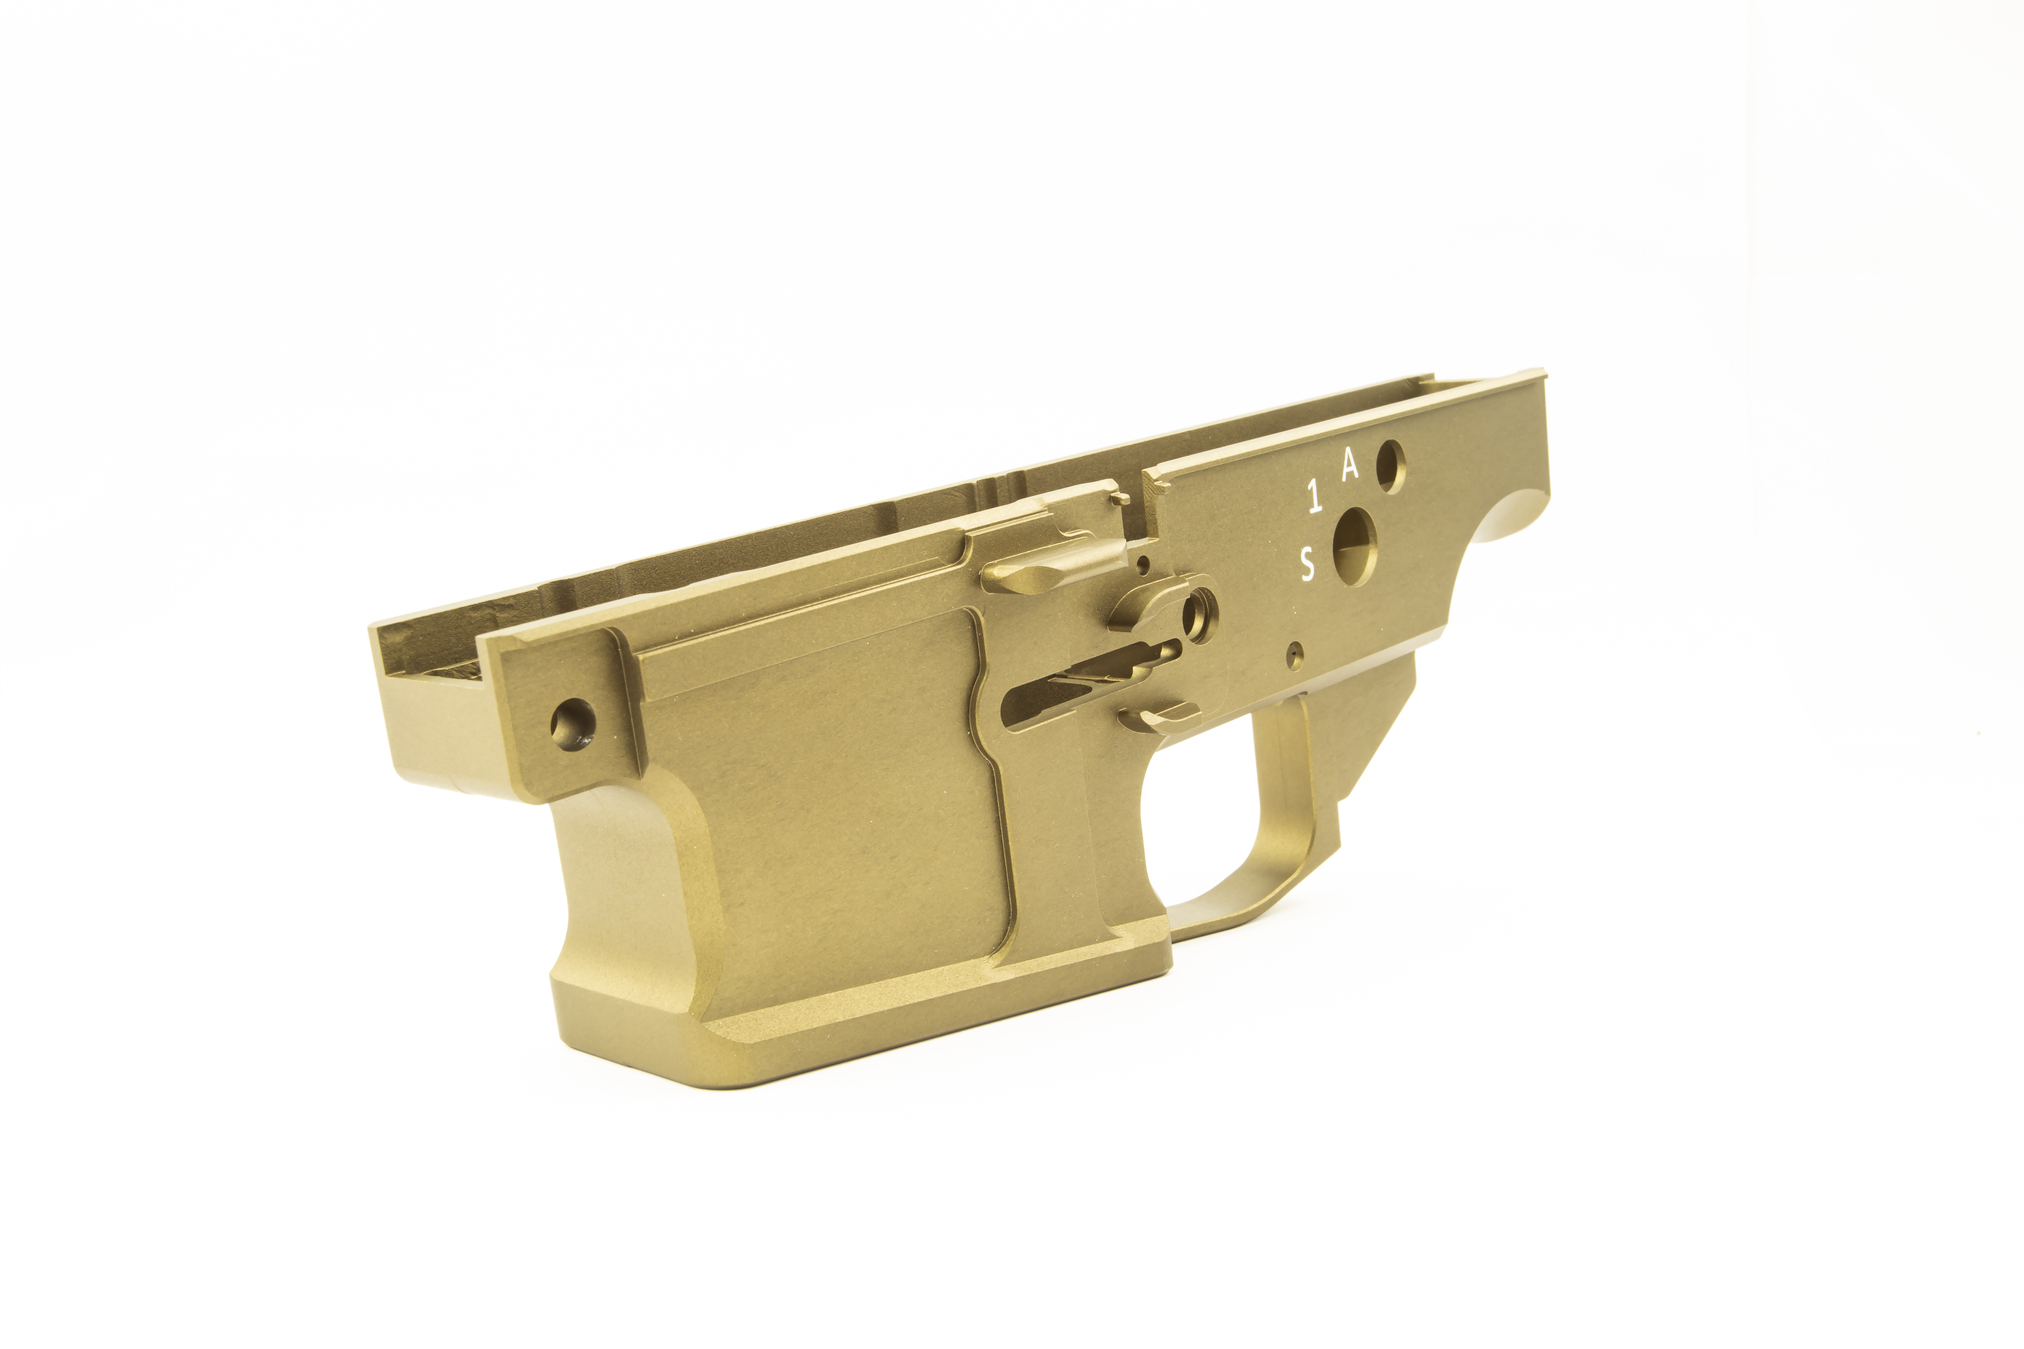 RENEGADE CNC Aluminum 7075 Lower Receiver for VFC SCAR H GBB